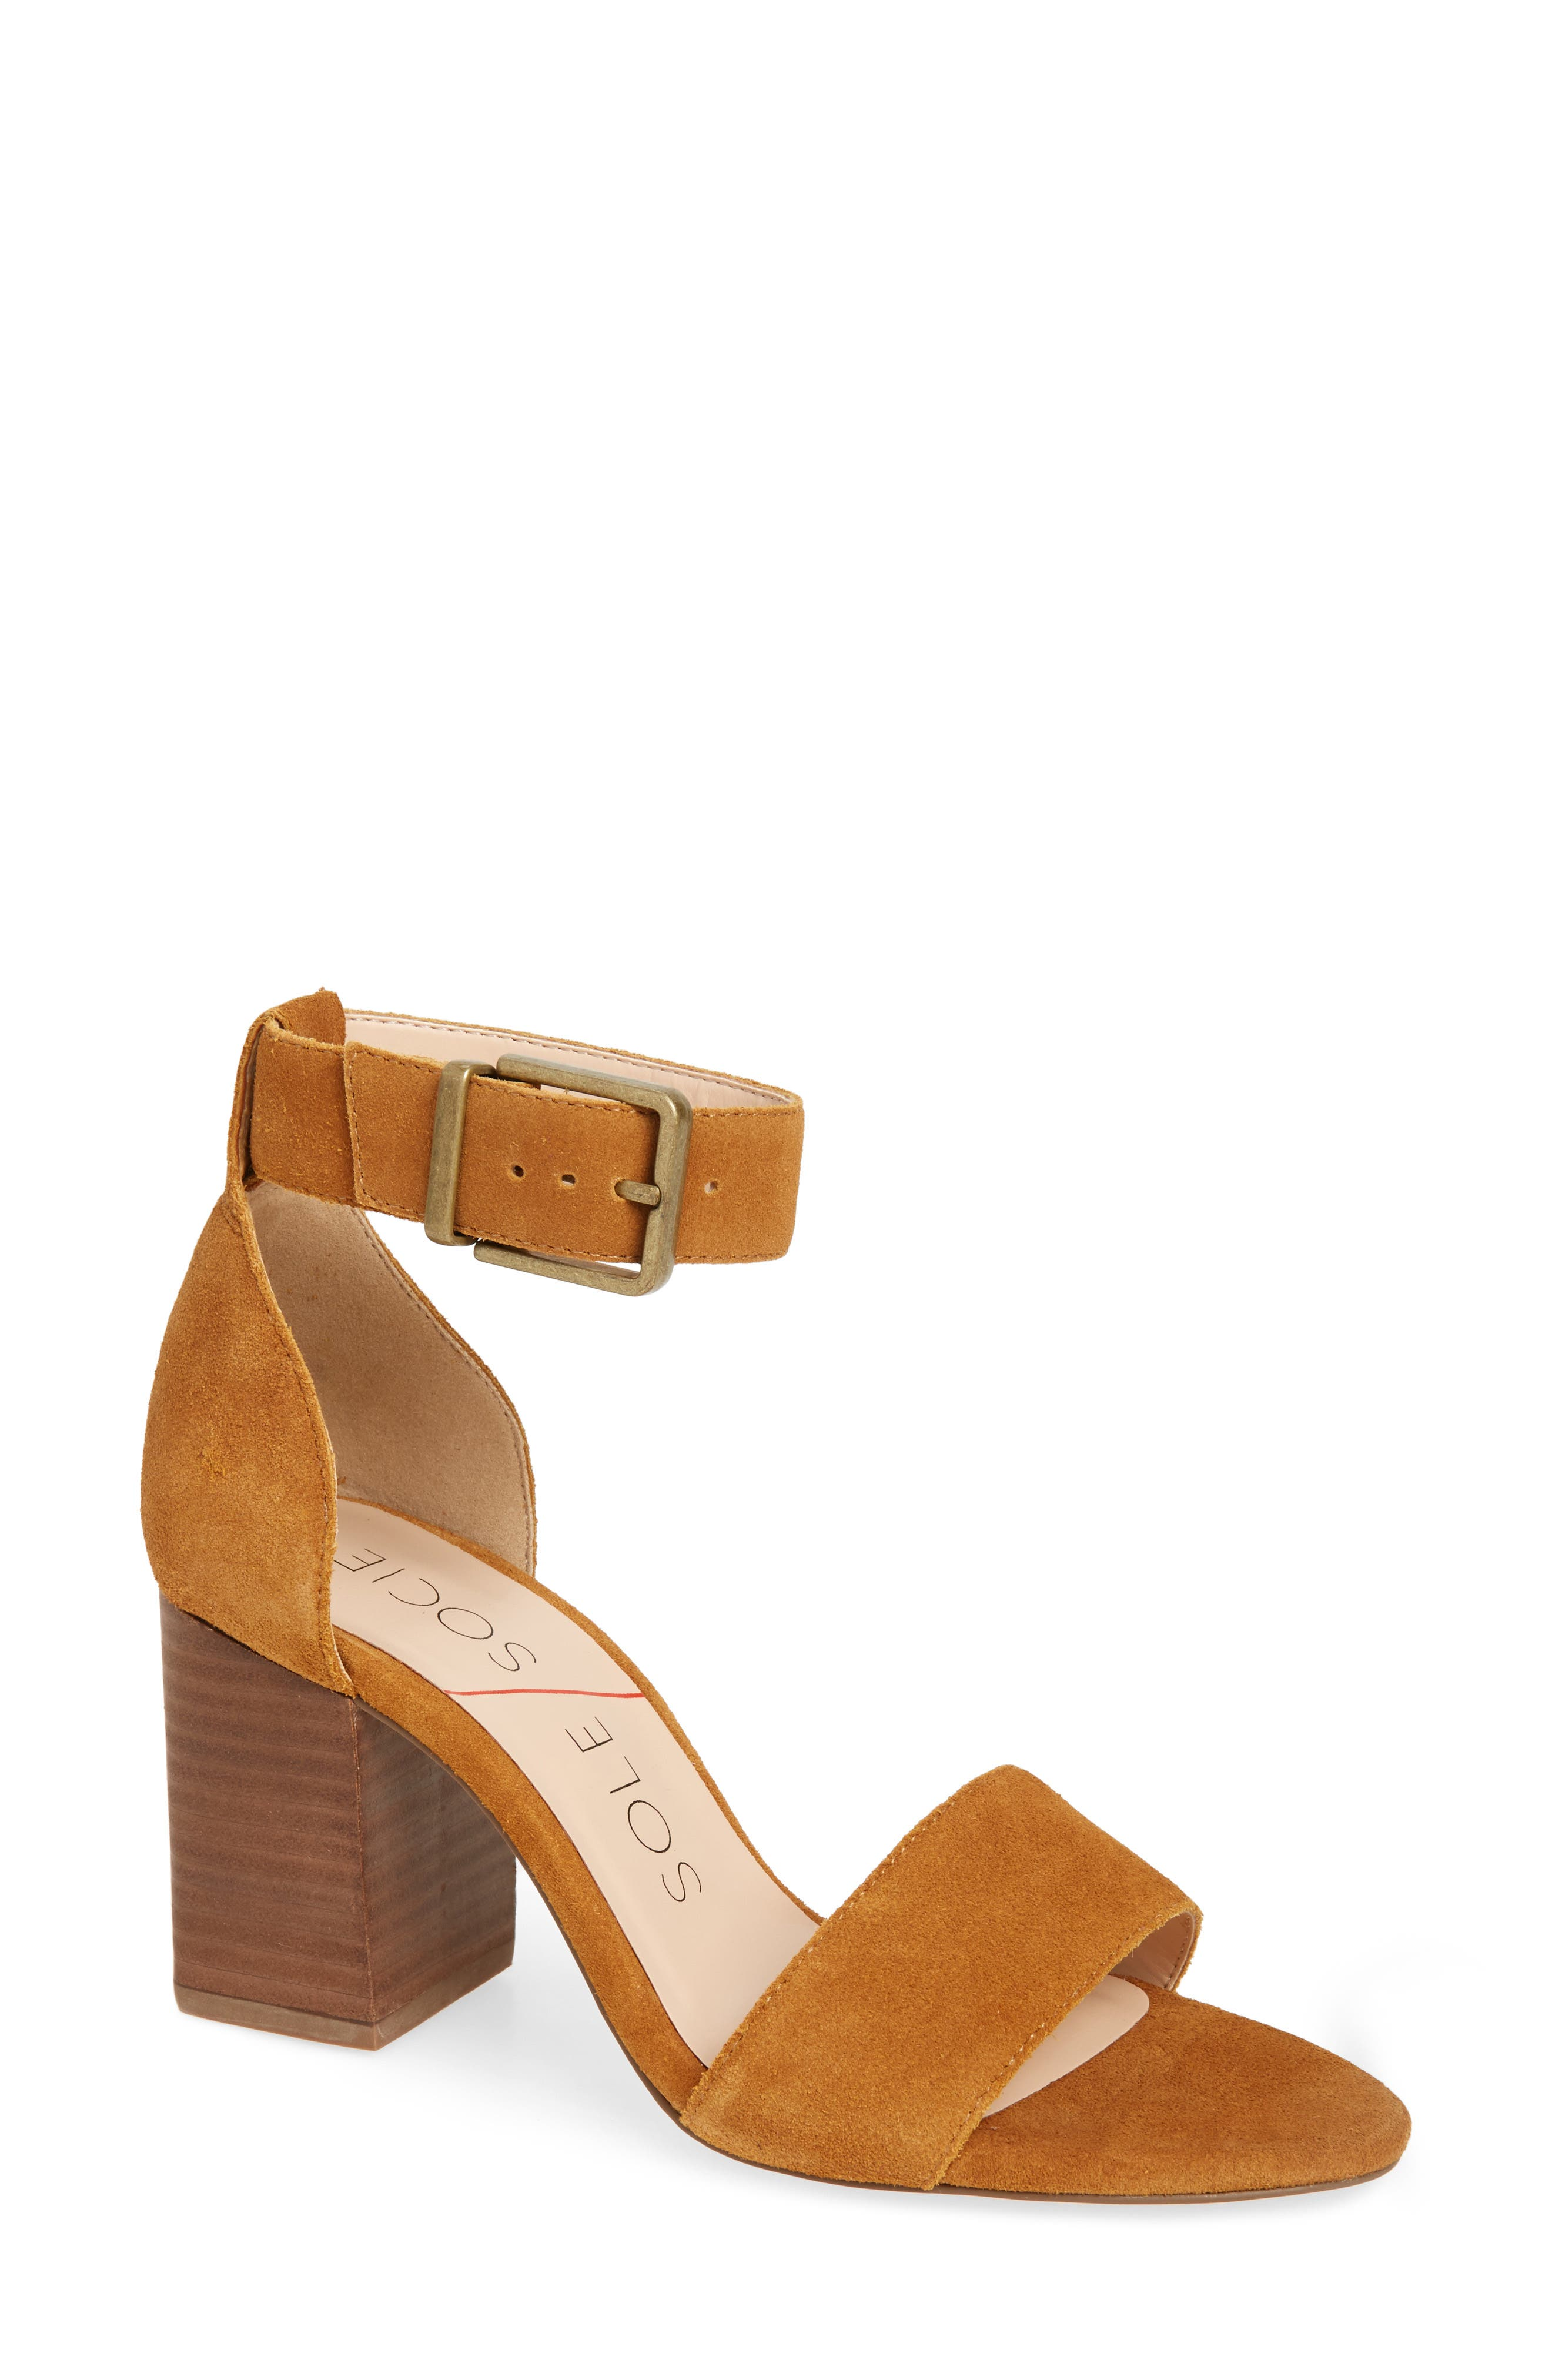 Montana Sandal,                         Main,                         color, Camel